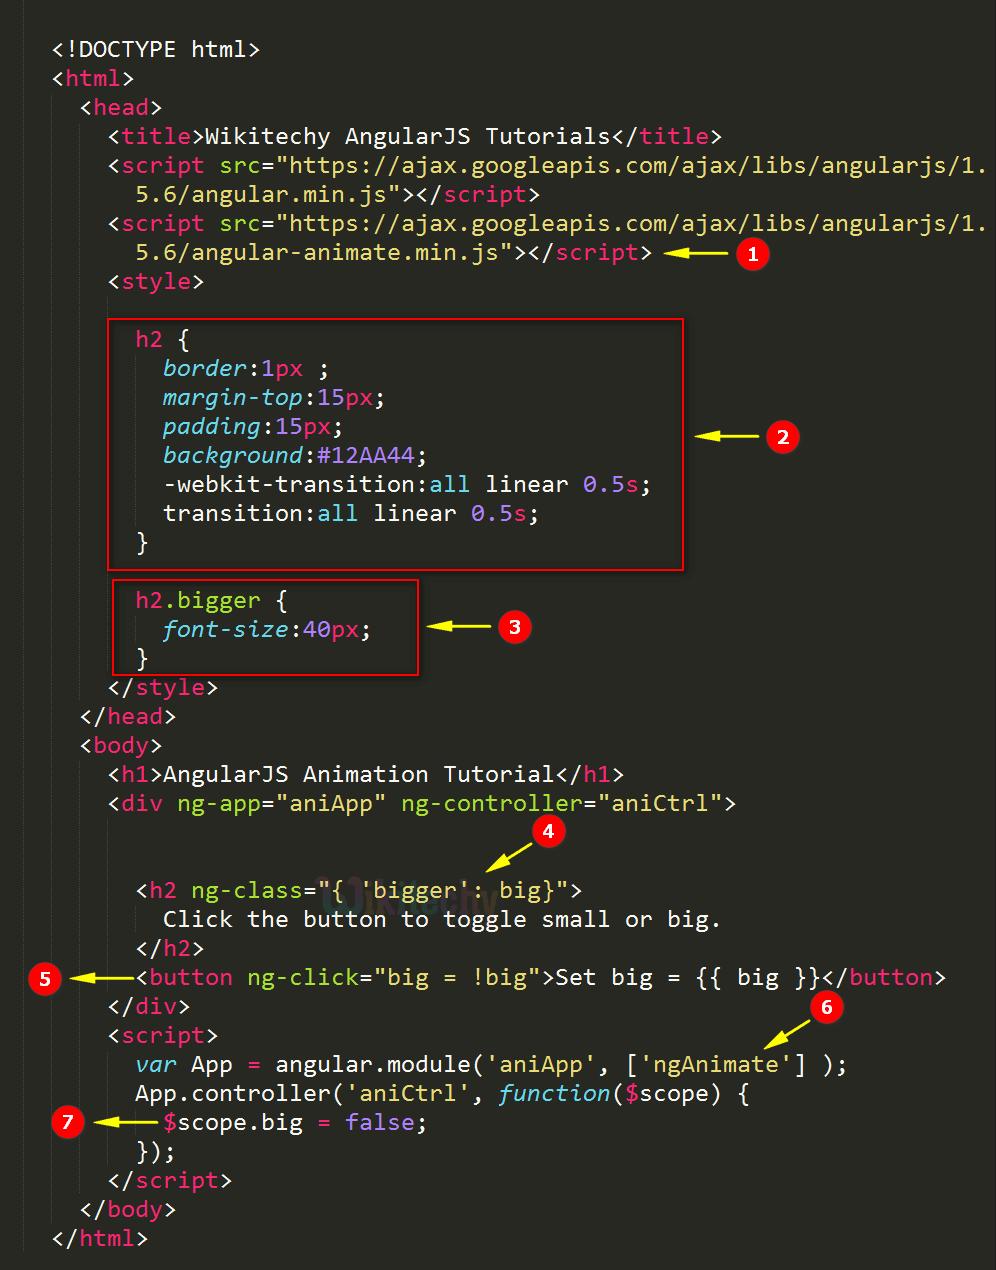 Code Explanation for AngularJS Animation